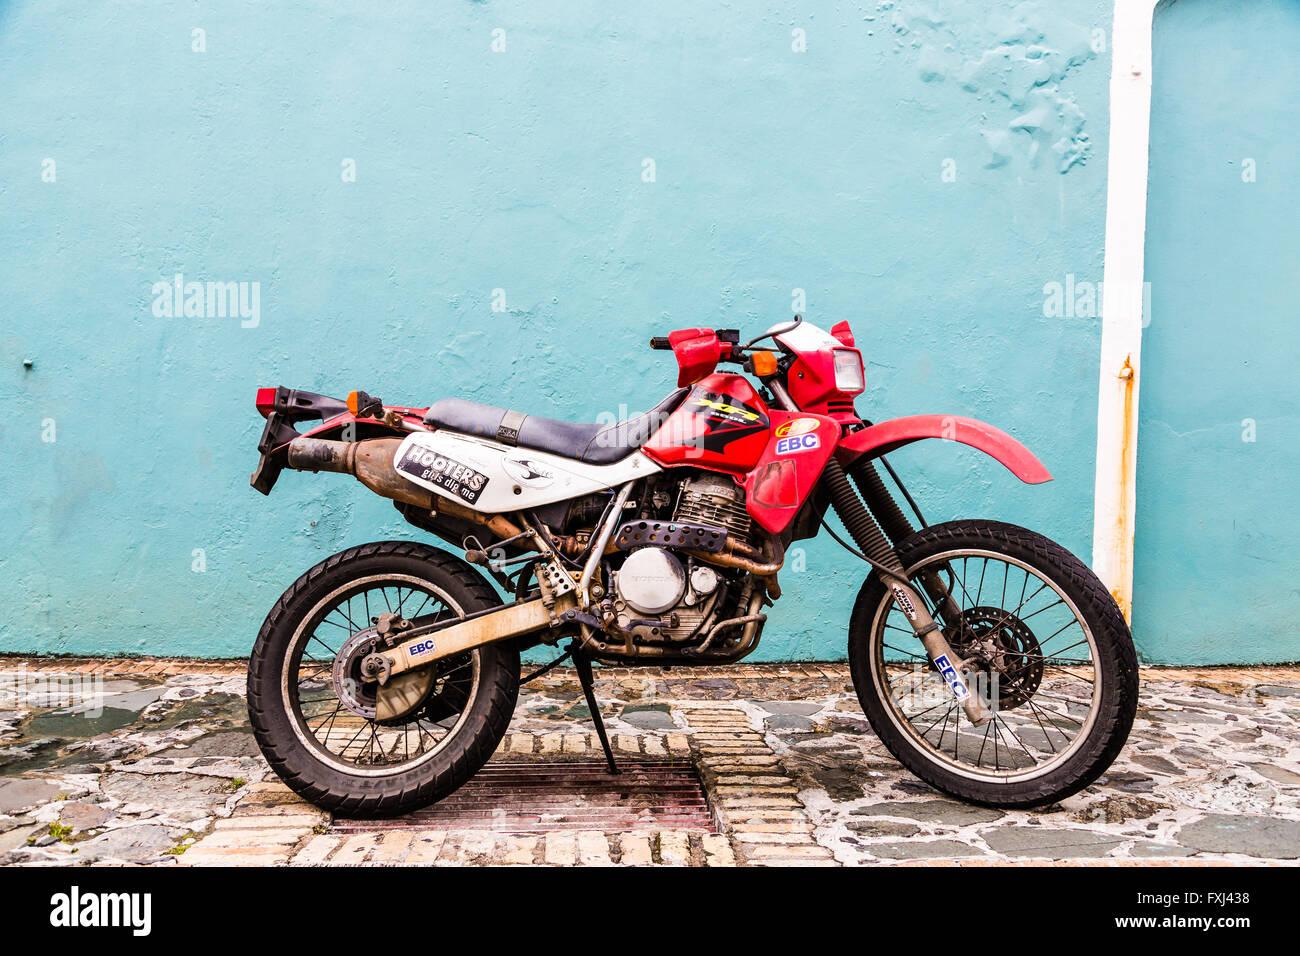 An Old Honda Dirt Bike in Cobblestone Street - Stock Image